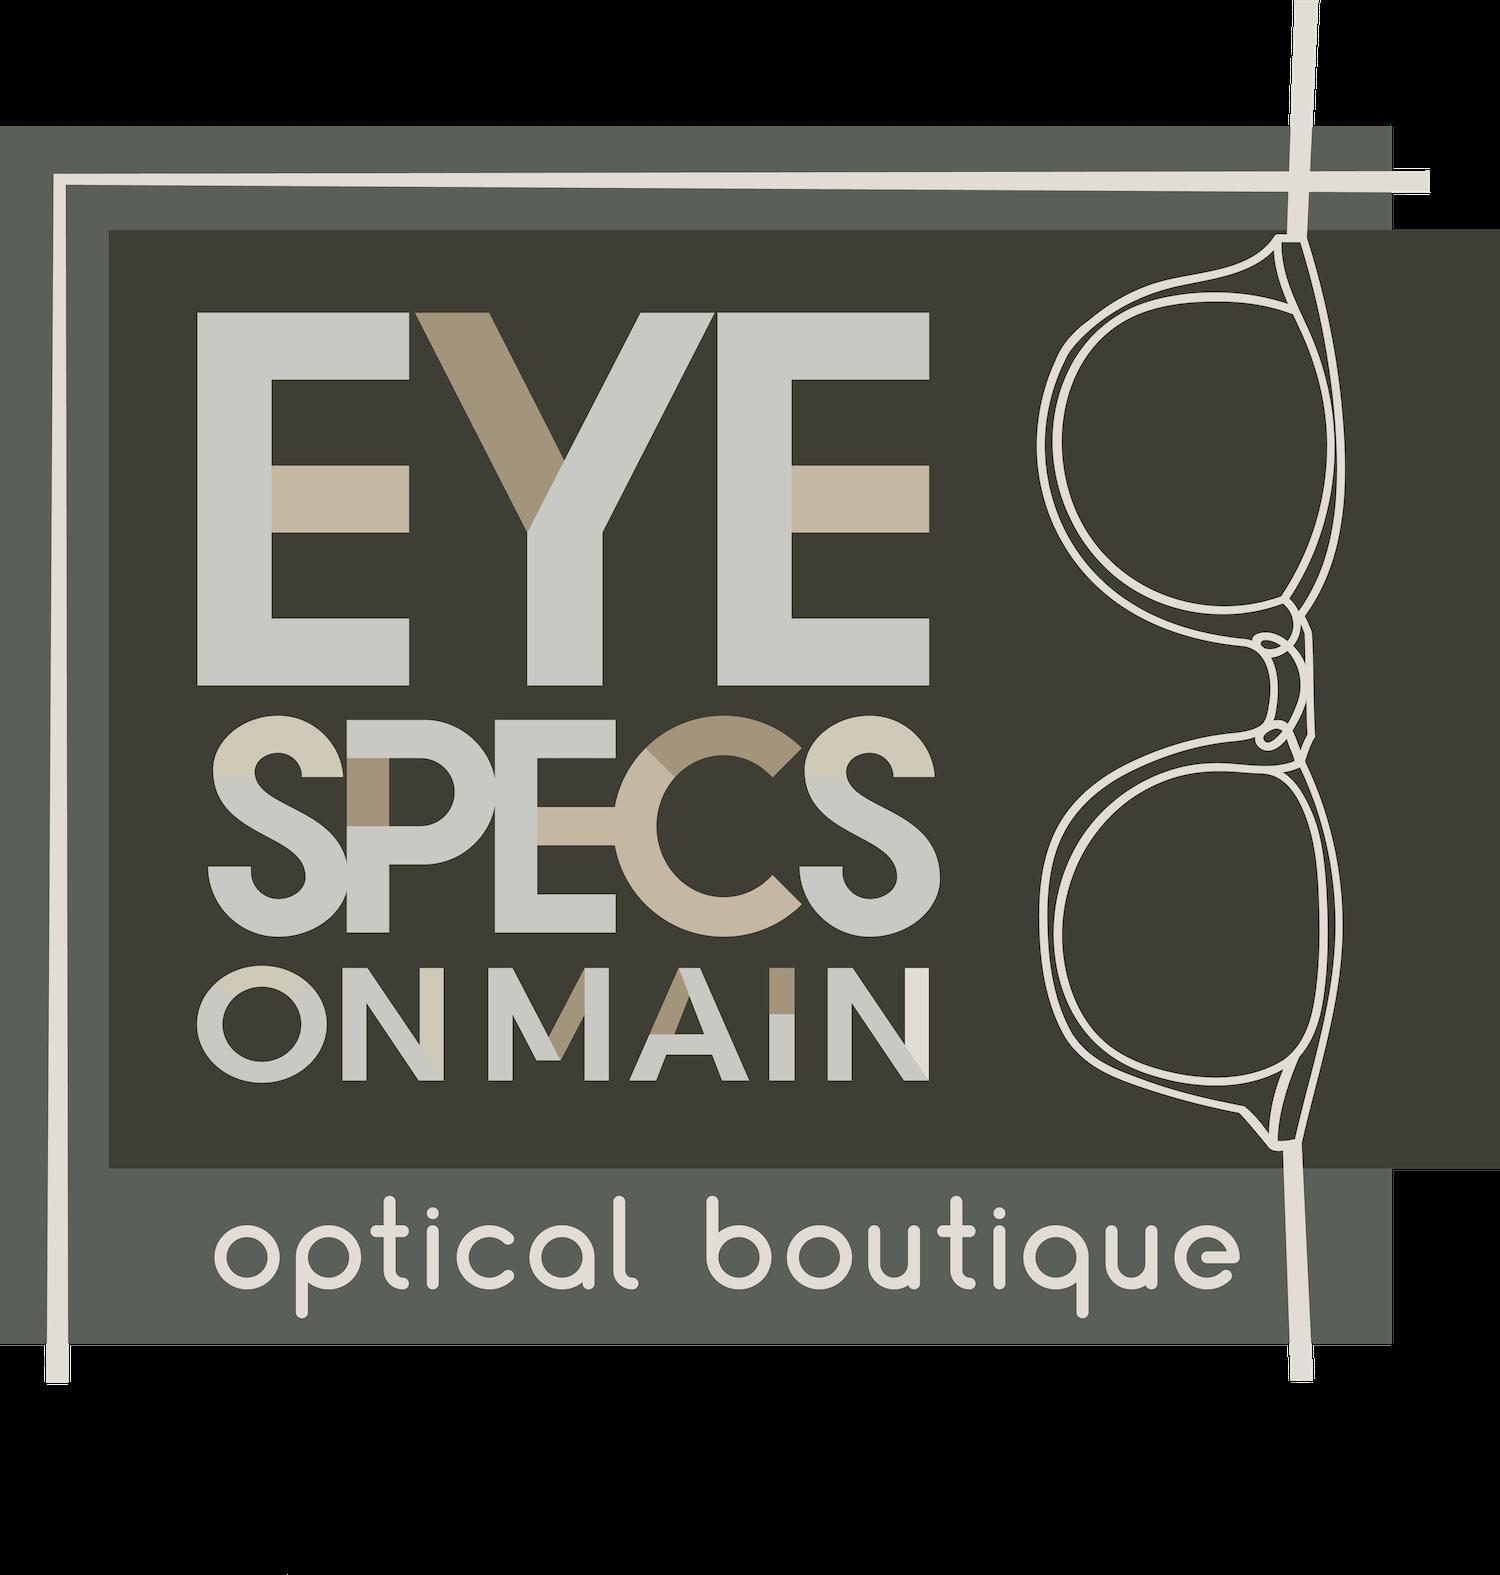 Eye Specs on Main Logo